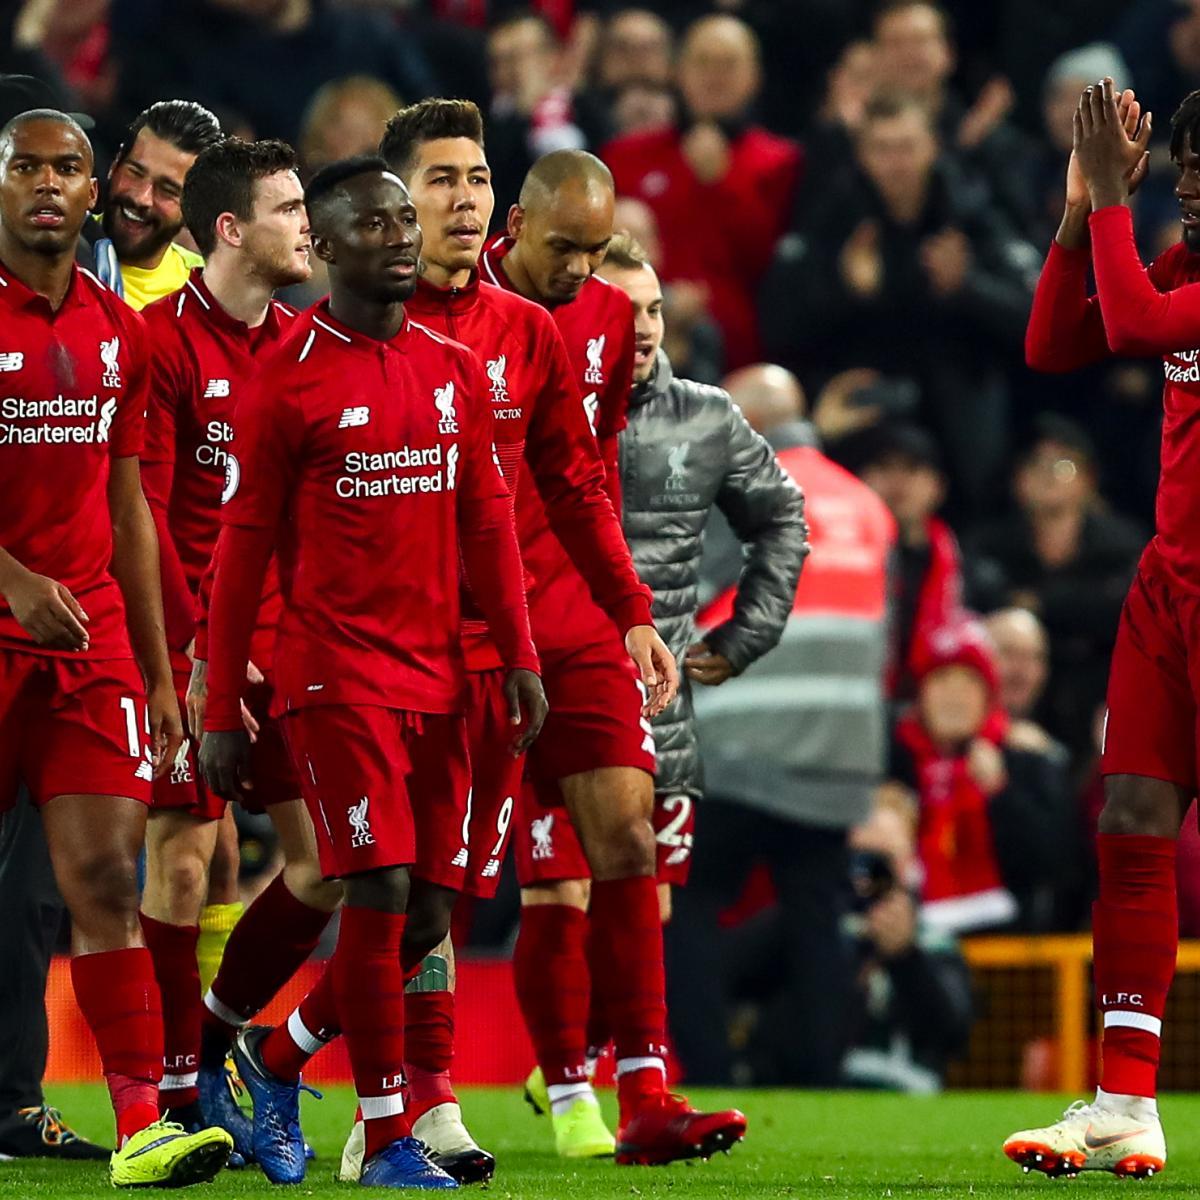 Burnley Vs. Liverpool: Odds, Preview, Live Stream, TV Info